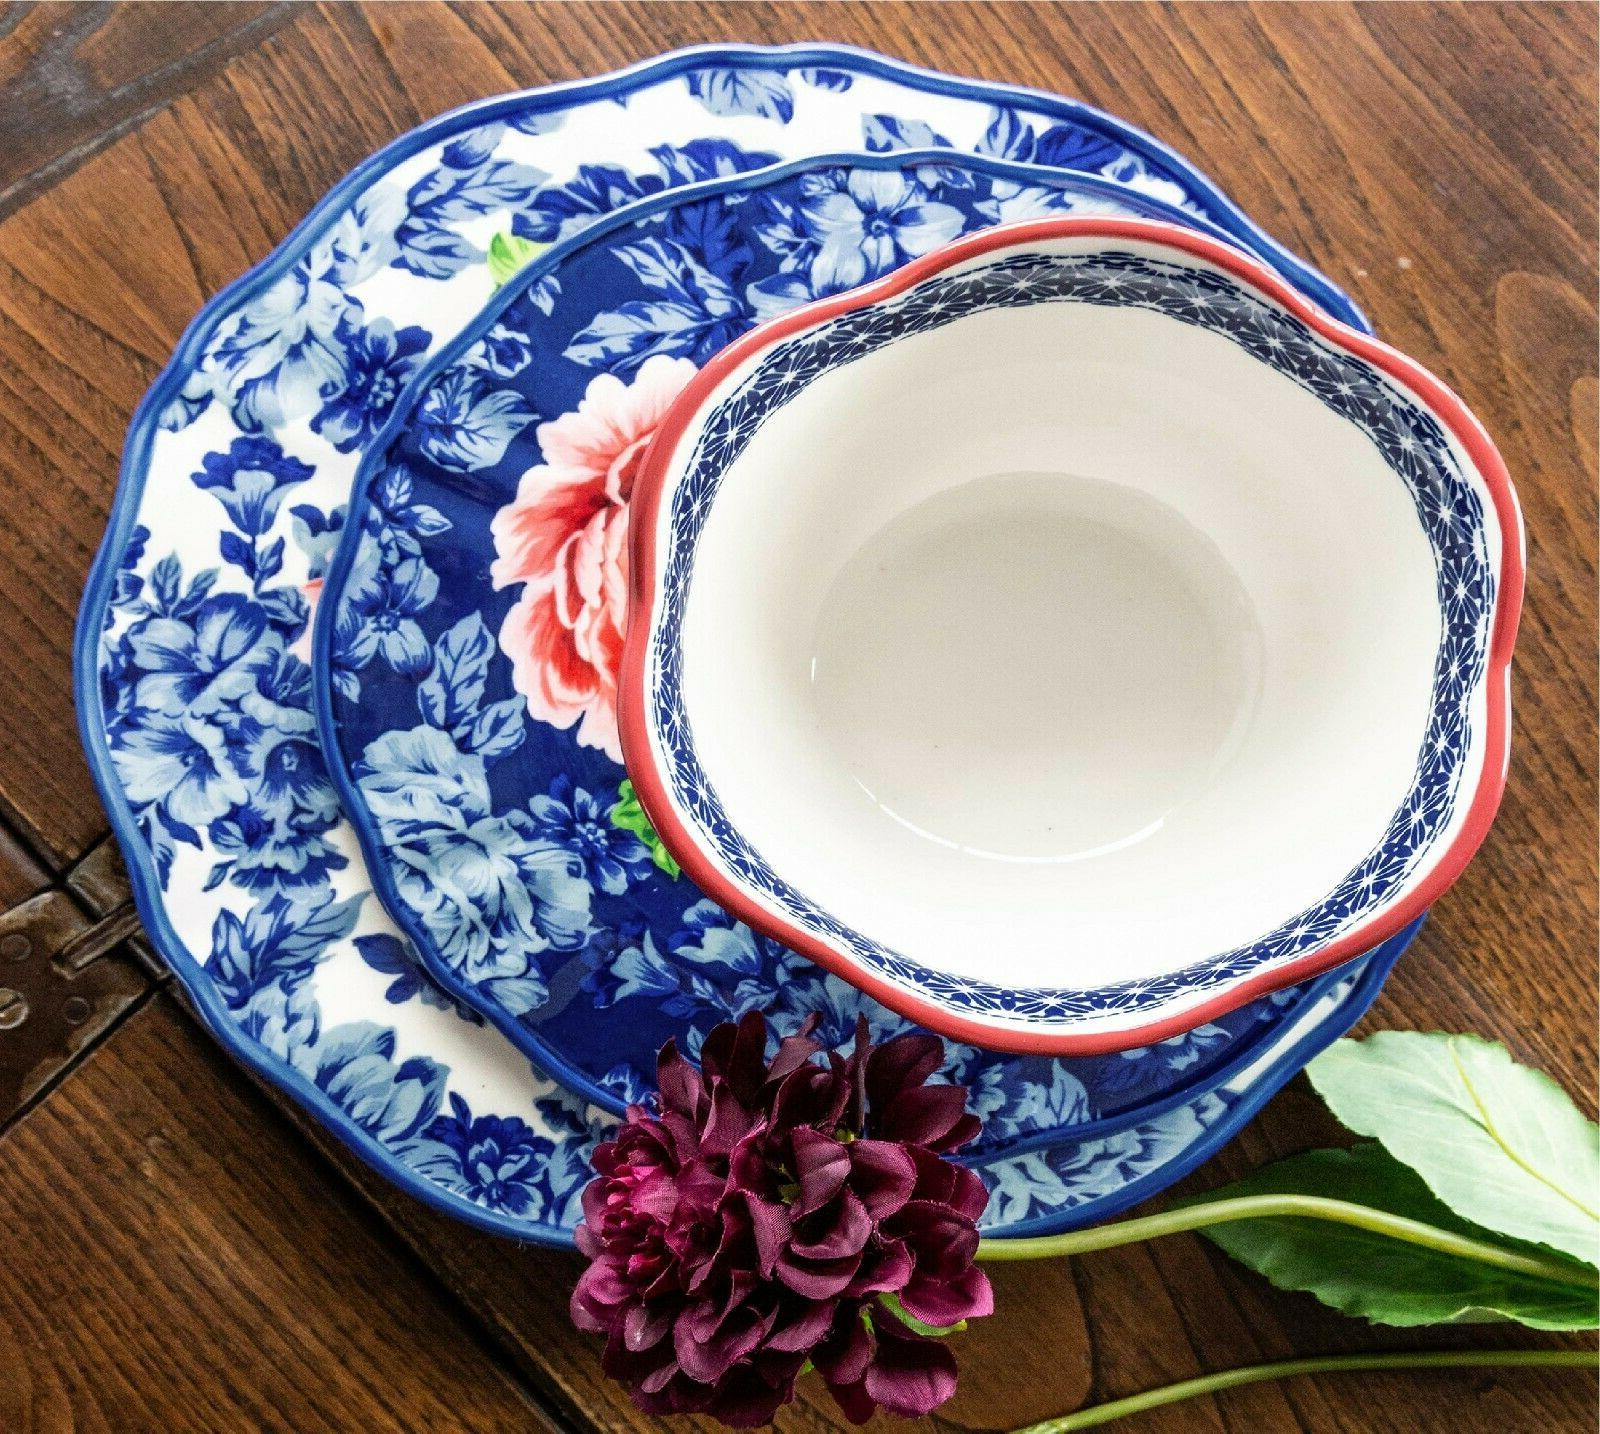 The Pioneer Floral 12-Piece Dinnerware Set